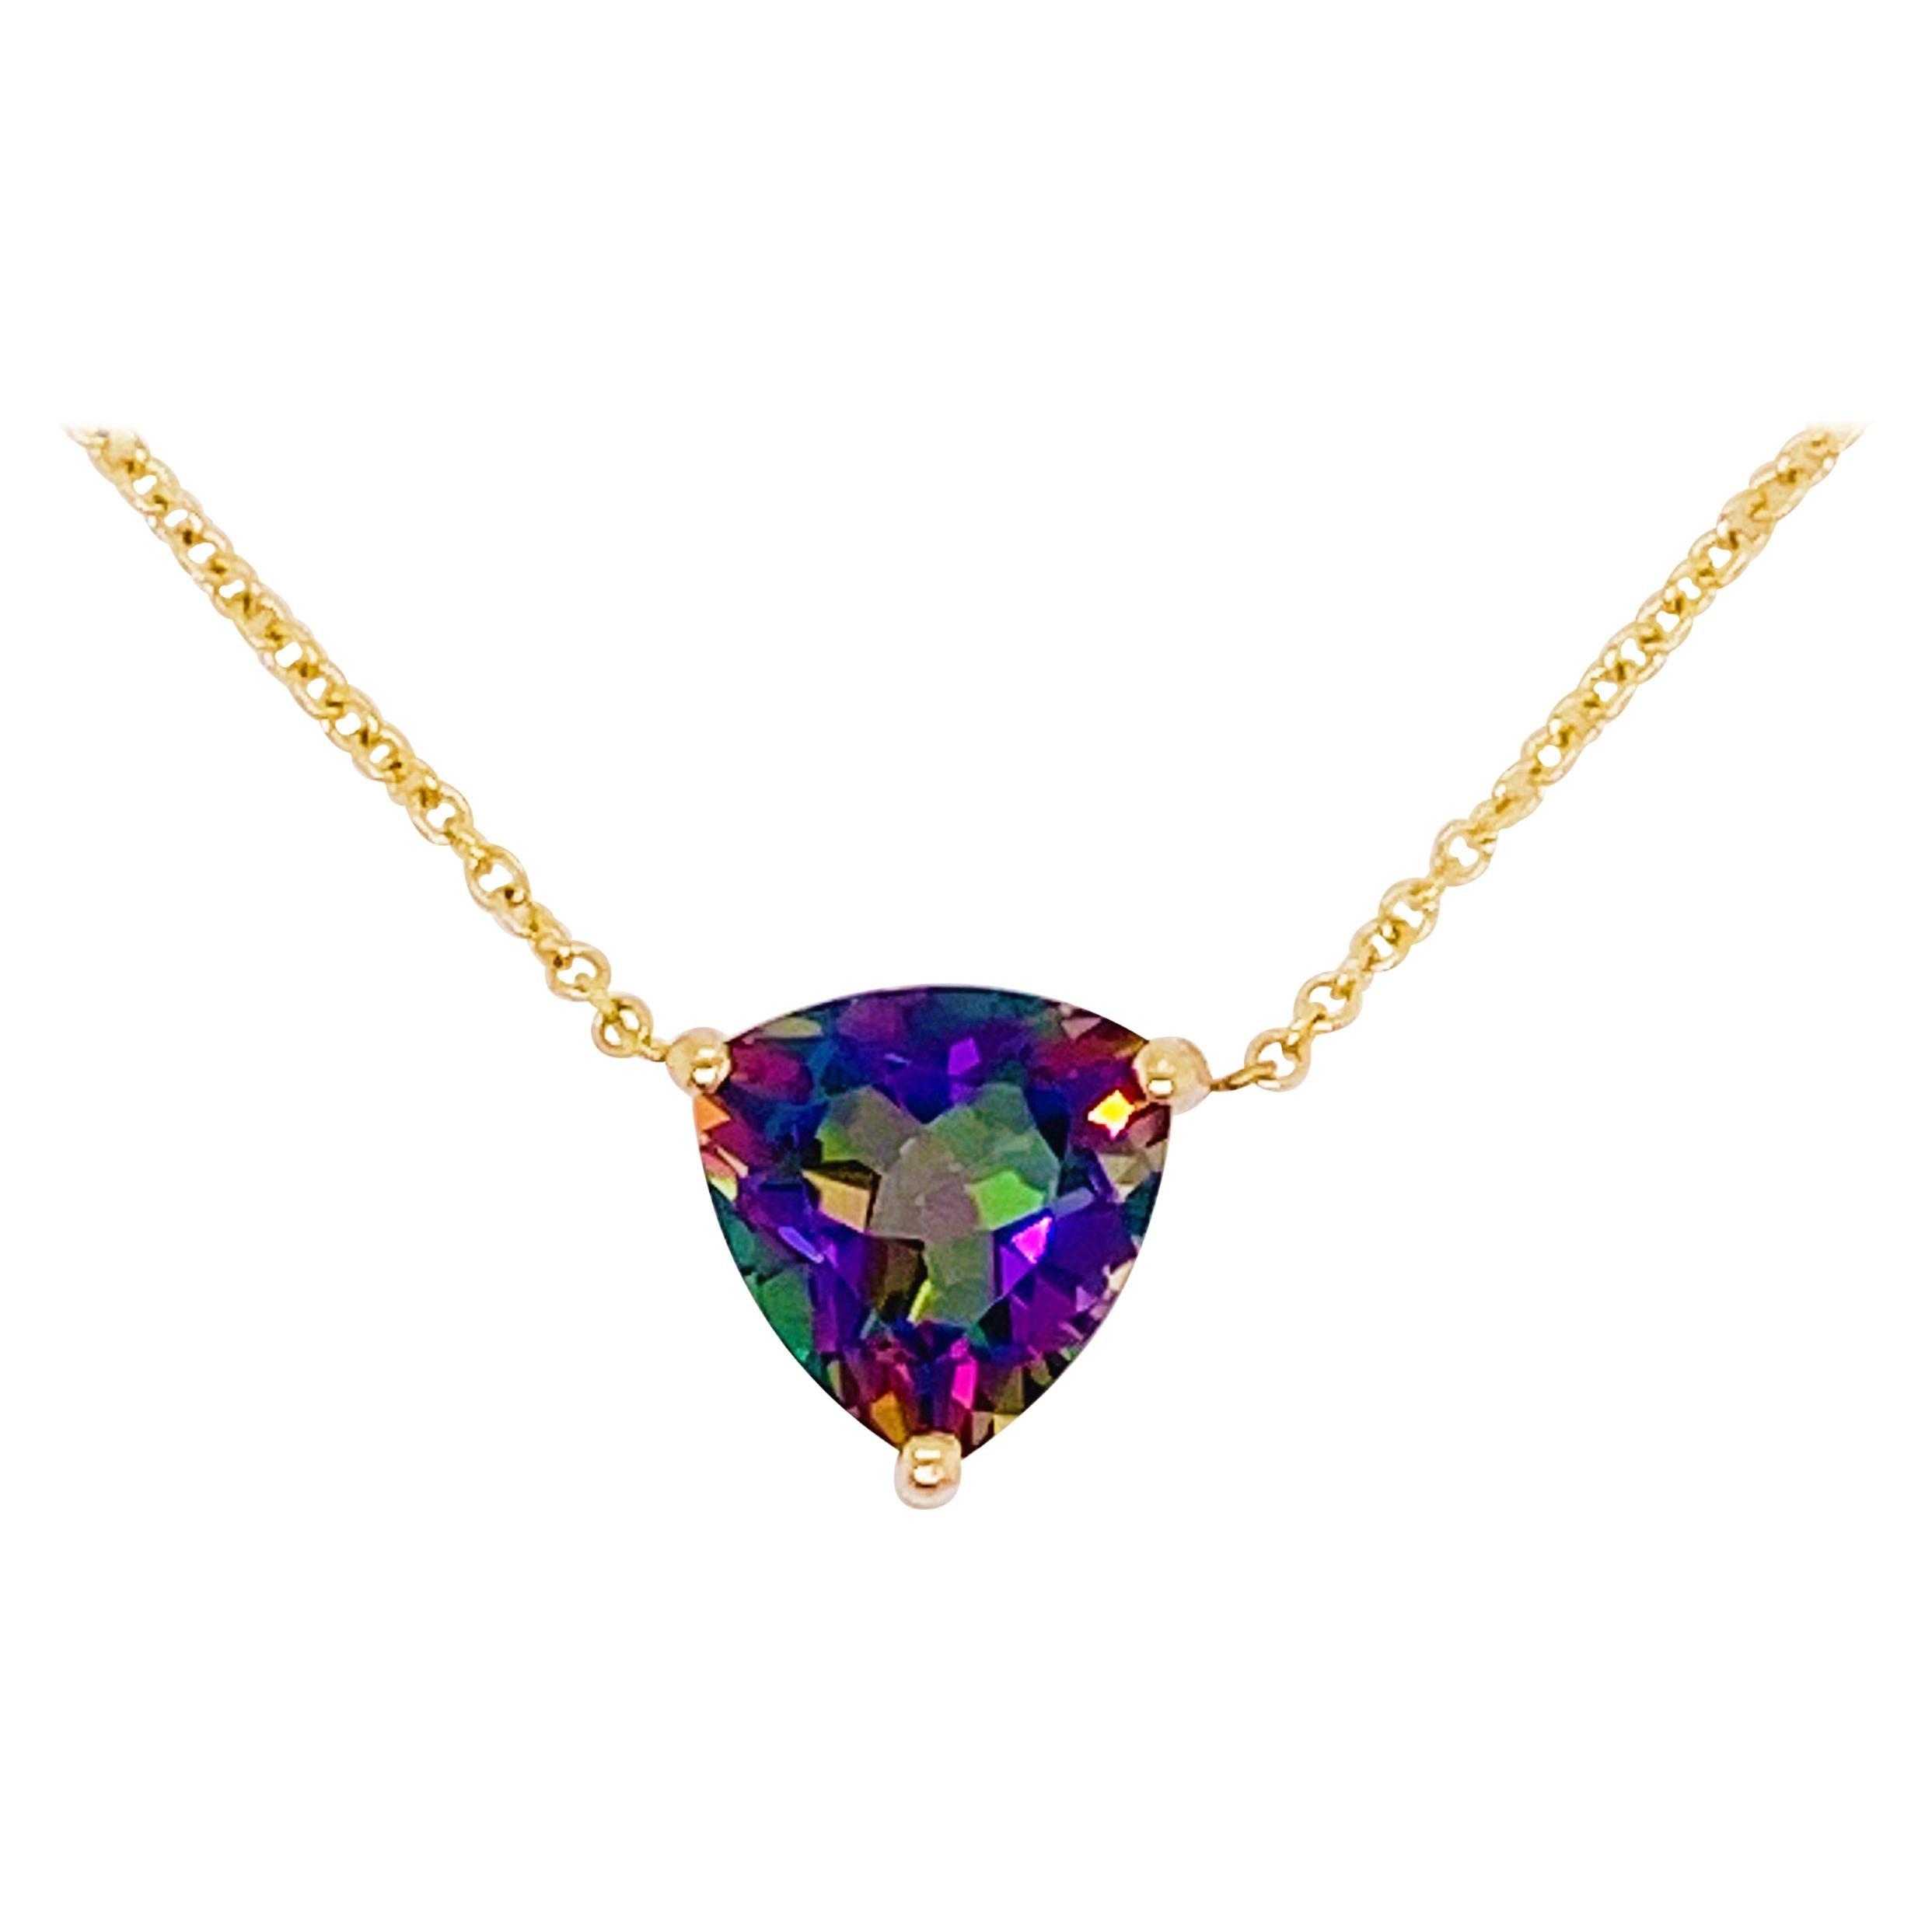 Mystic Topaz Necklace, 14k Gold Pendant, Trillion, #NeckMess, Rainbow Gemstone